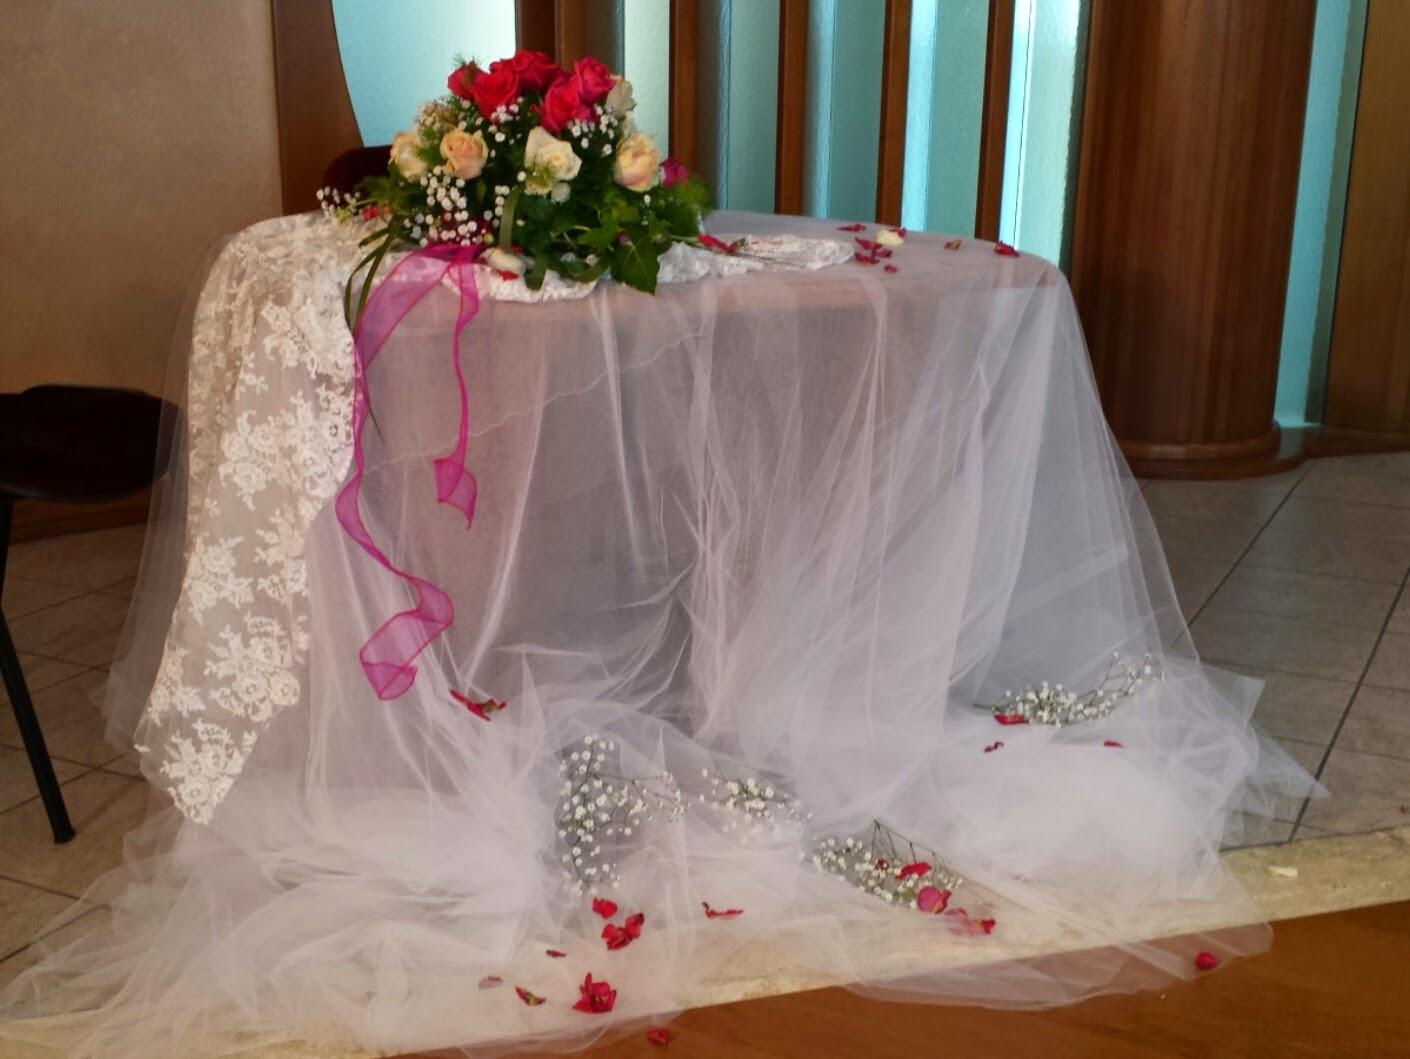 Tavoli da sposa per regali ix63 regardsdefemmes - Tavolo matrimonio casa sposa ...